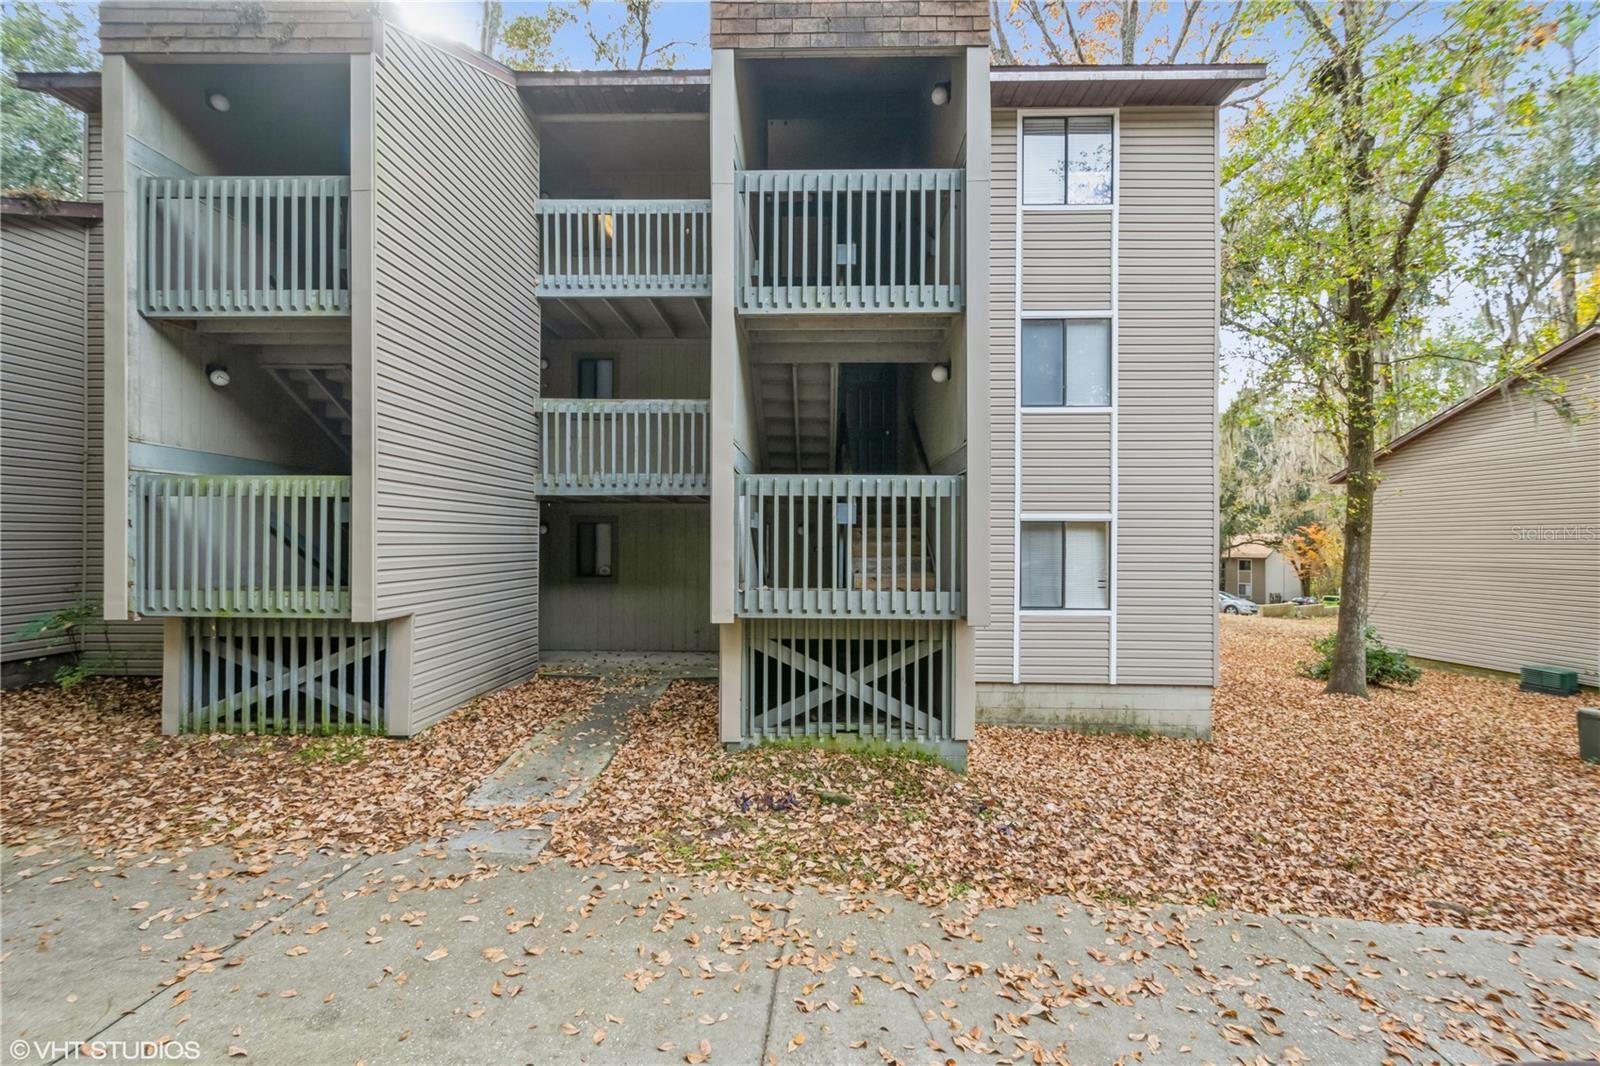 107 SE 16TH AVENUE #R302, Gainesville, FL 32601 - #: GC445747